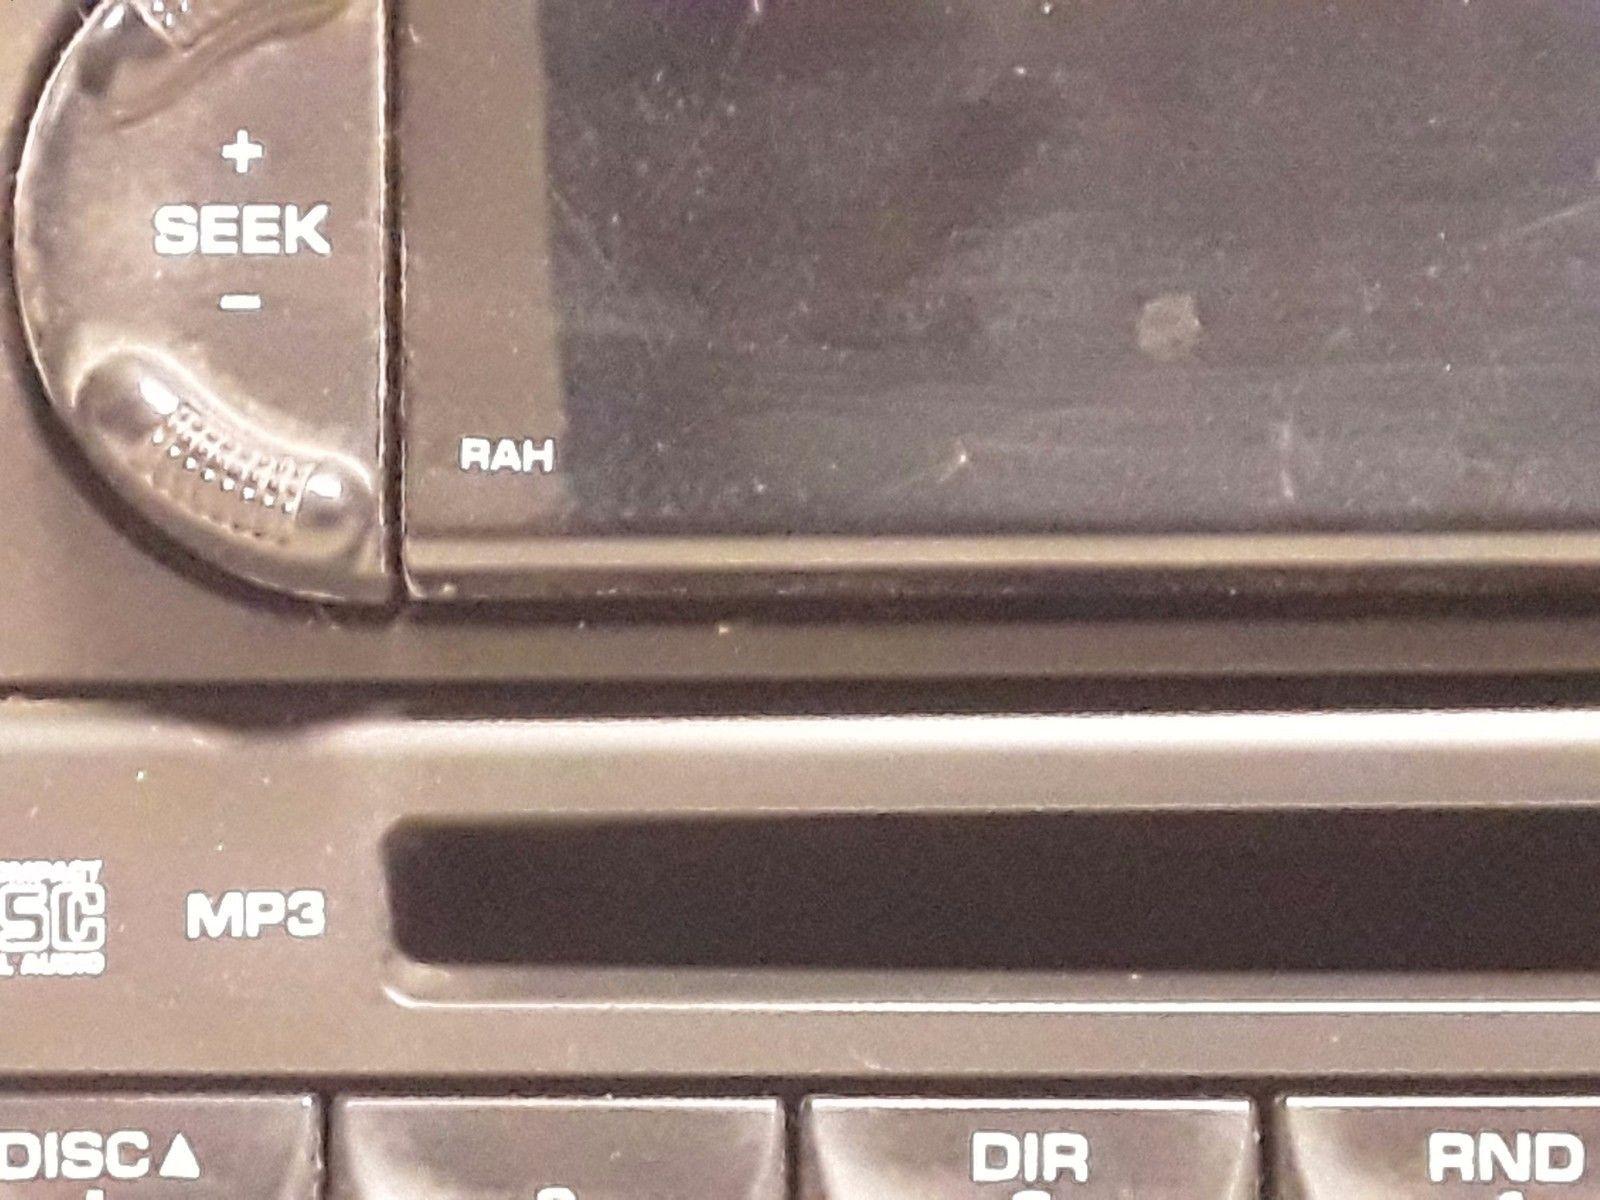 04 05 06 07 08 Chrysler Pacifica AM FM CD radio receiver OEM P05094564AC  RAH image 2